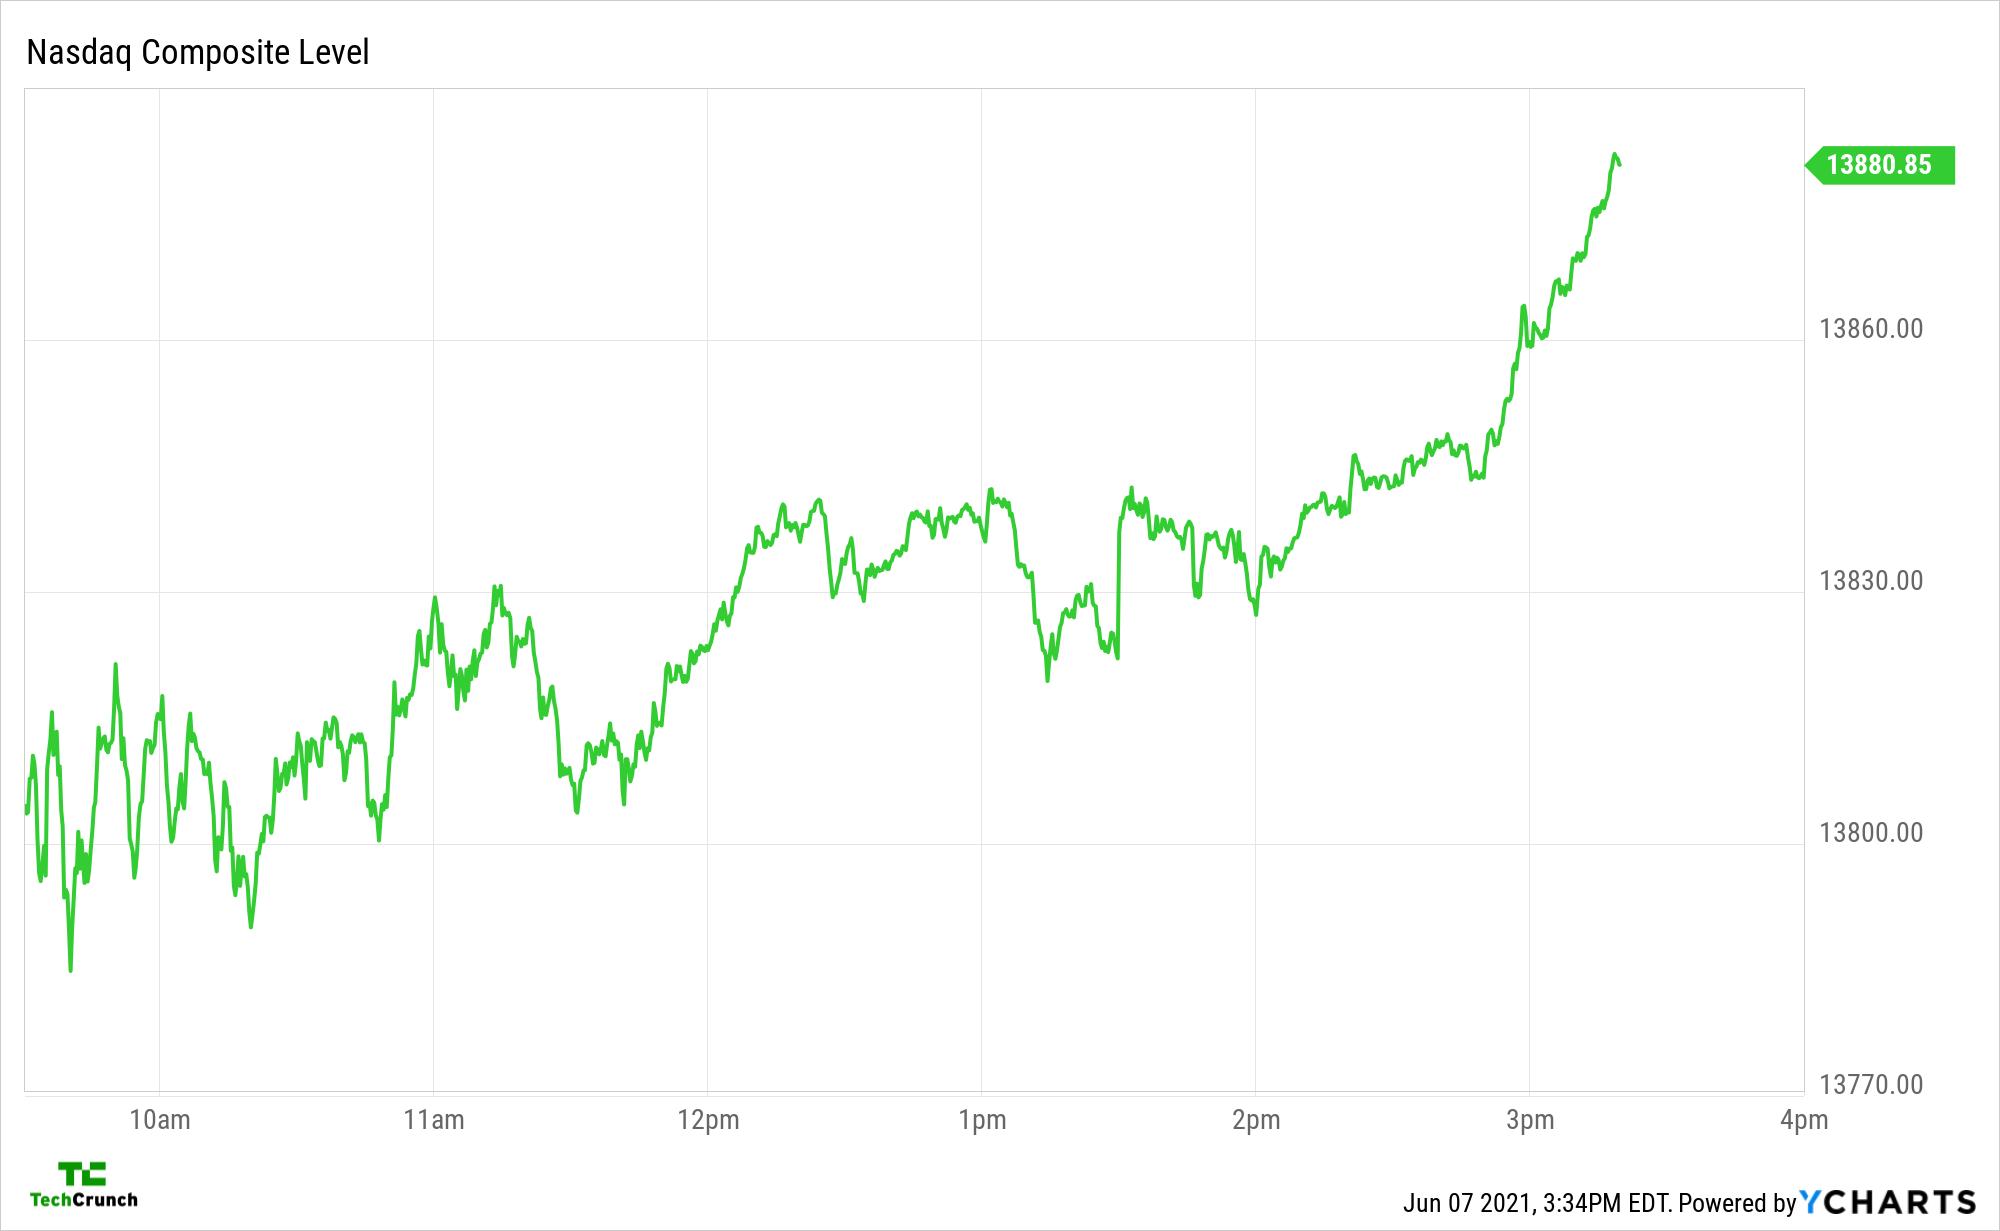 ^IXIC chart